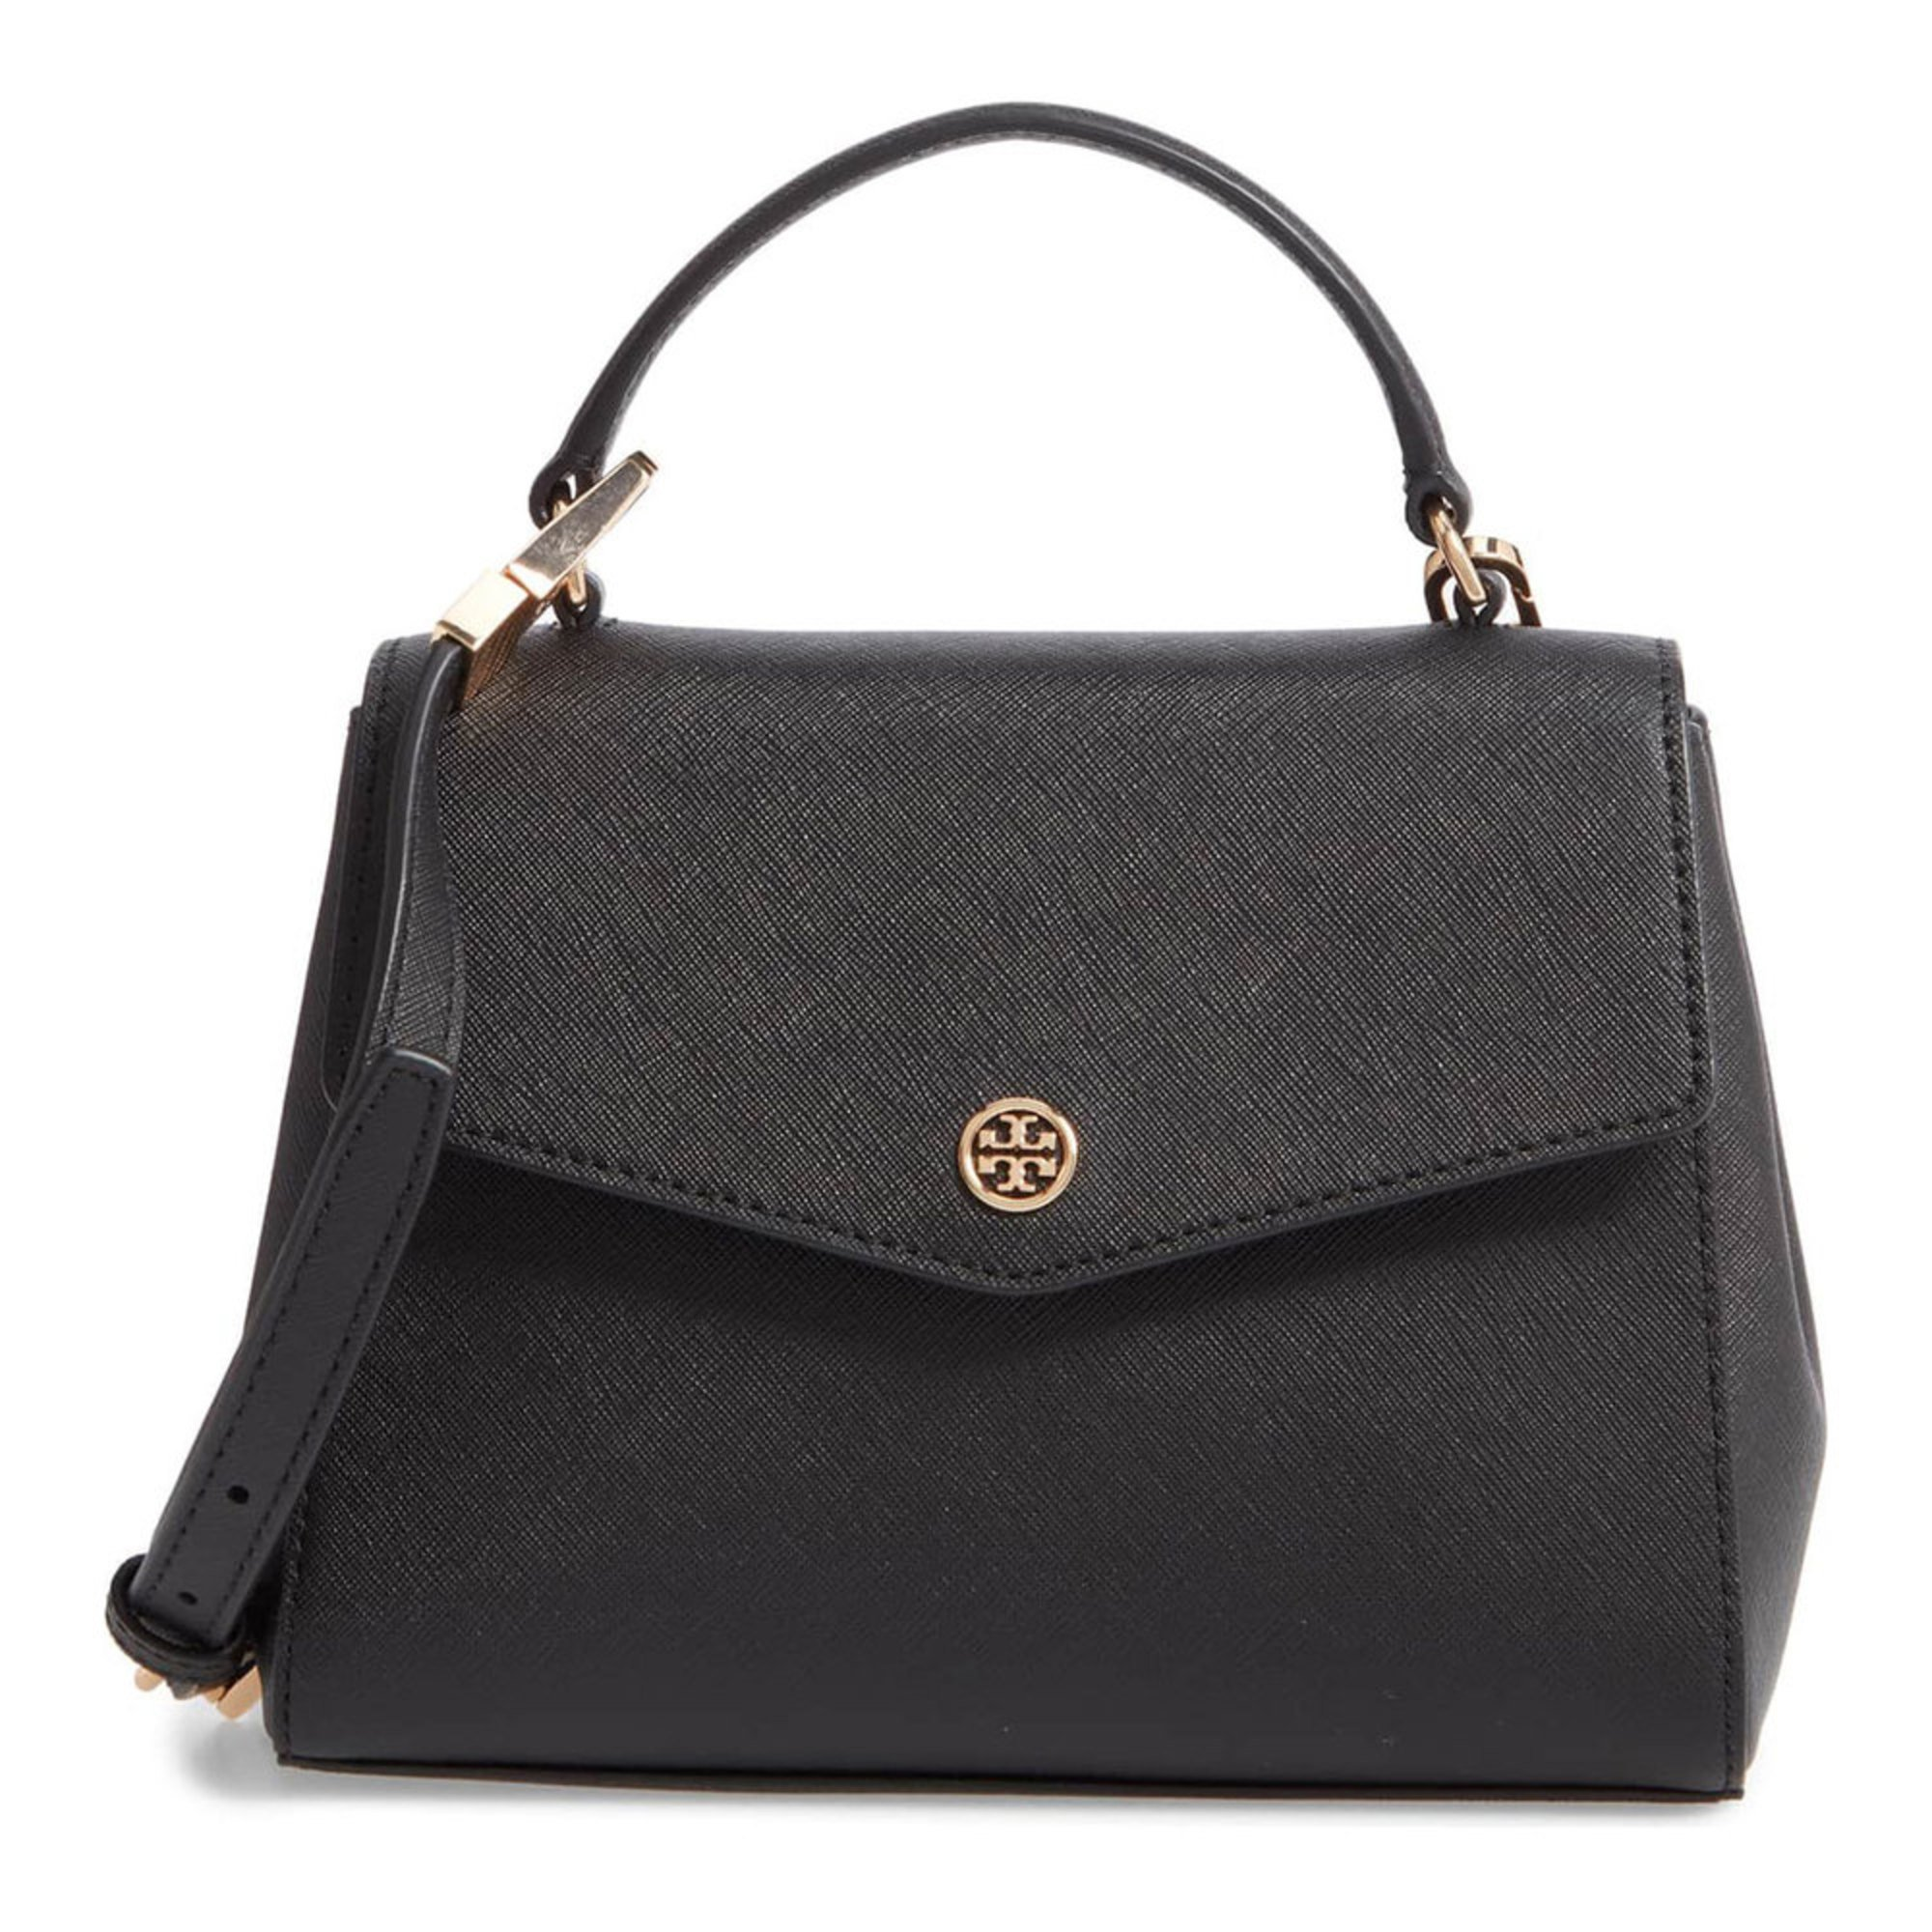 a1a88b0ee5 Tory Burch Robinson Small Top Handle Satchel   Satchels   Handbags ...